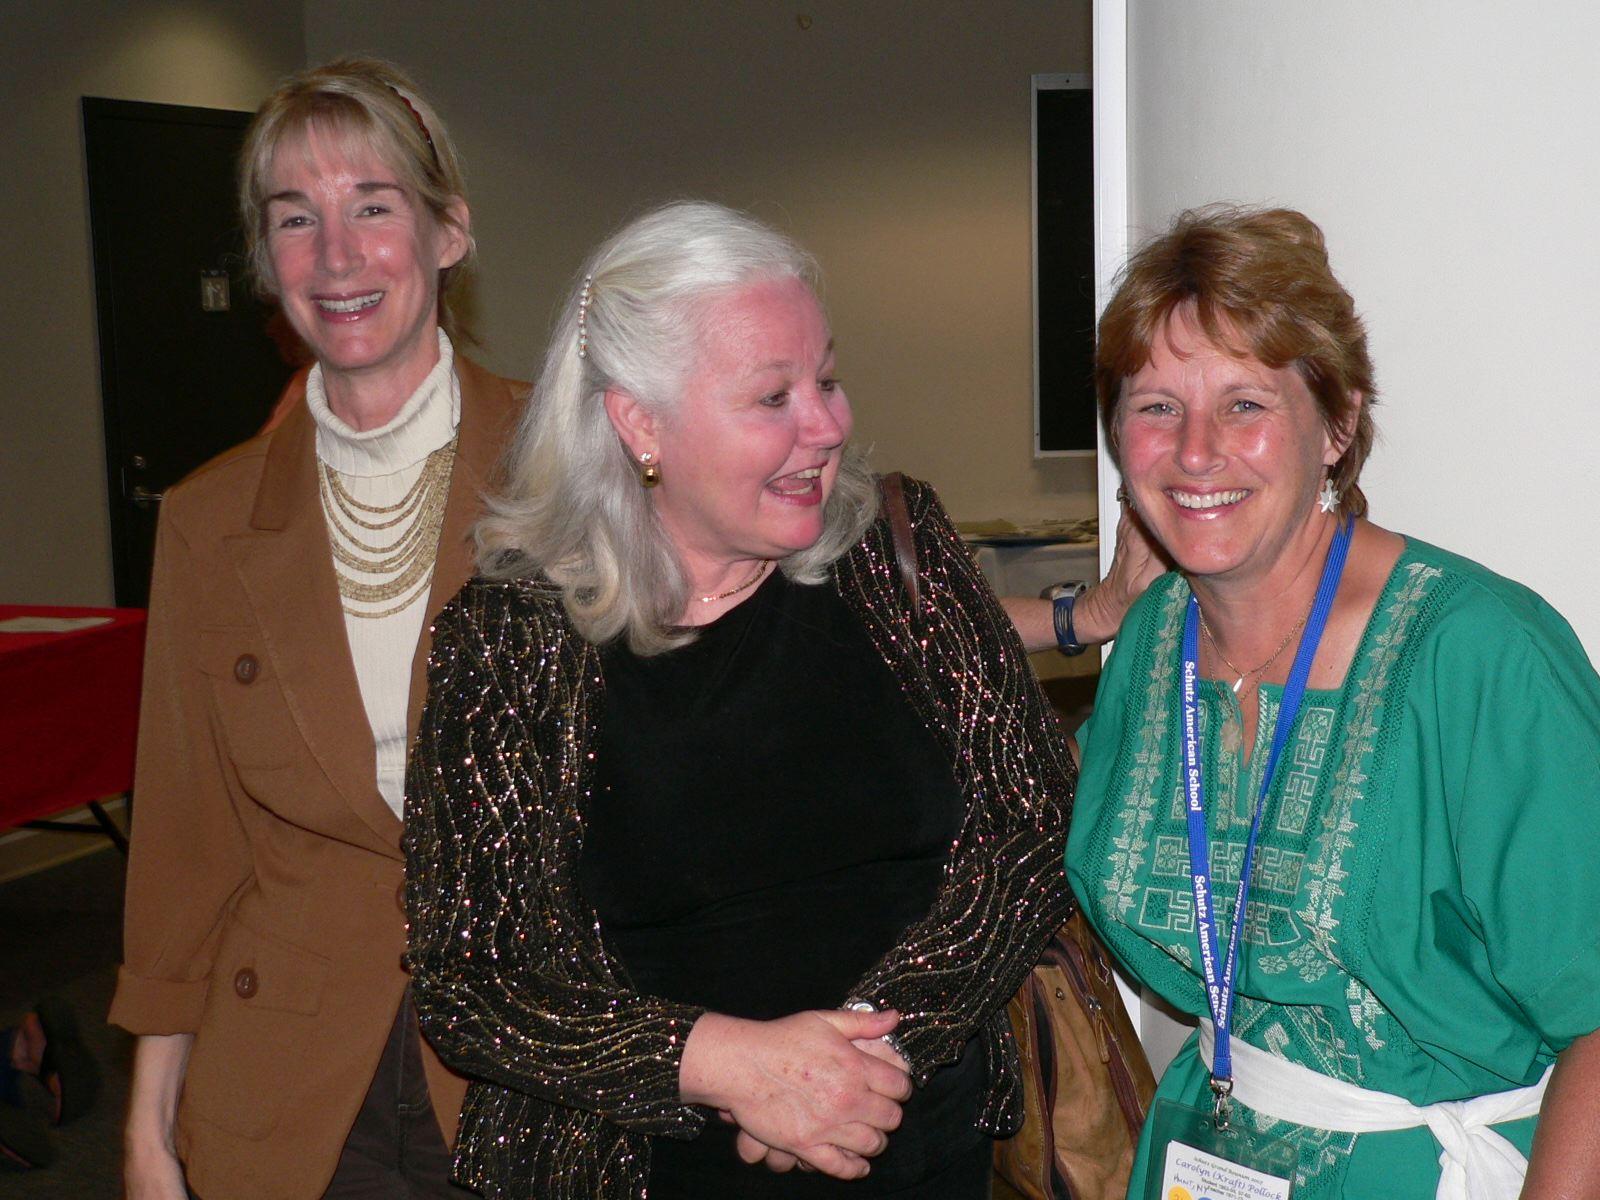 Barbara Murray, Deb Martin and Carolyn Pollock